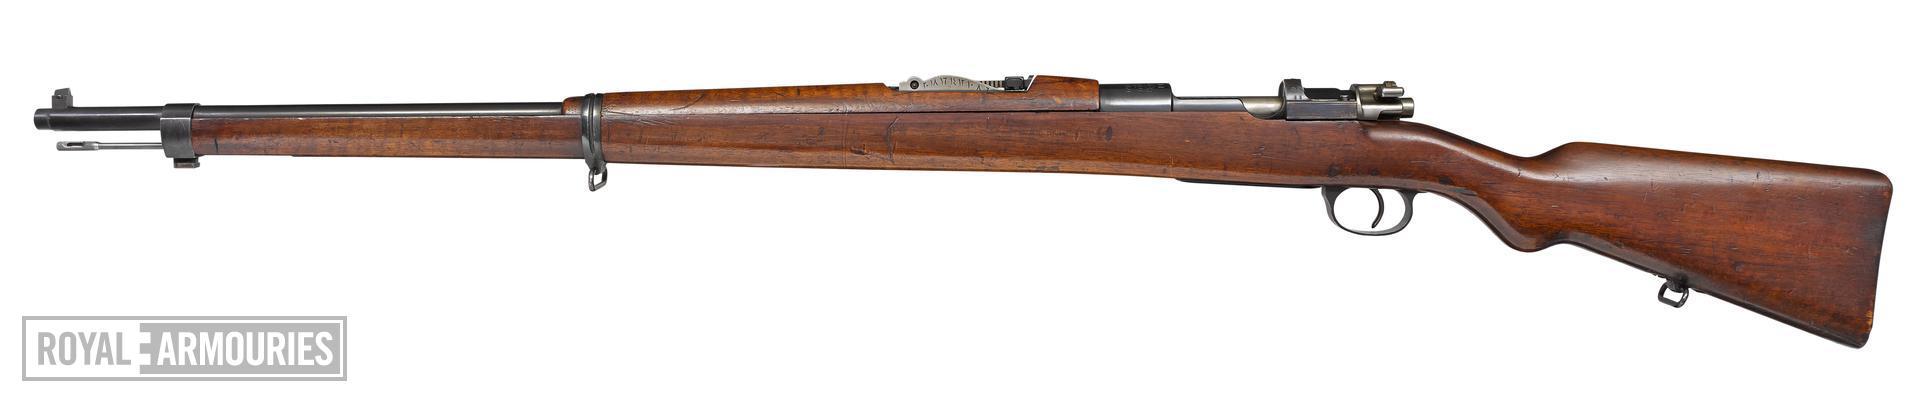 Mauser Model 1903 rifle